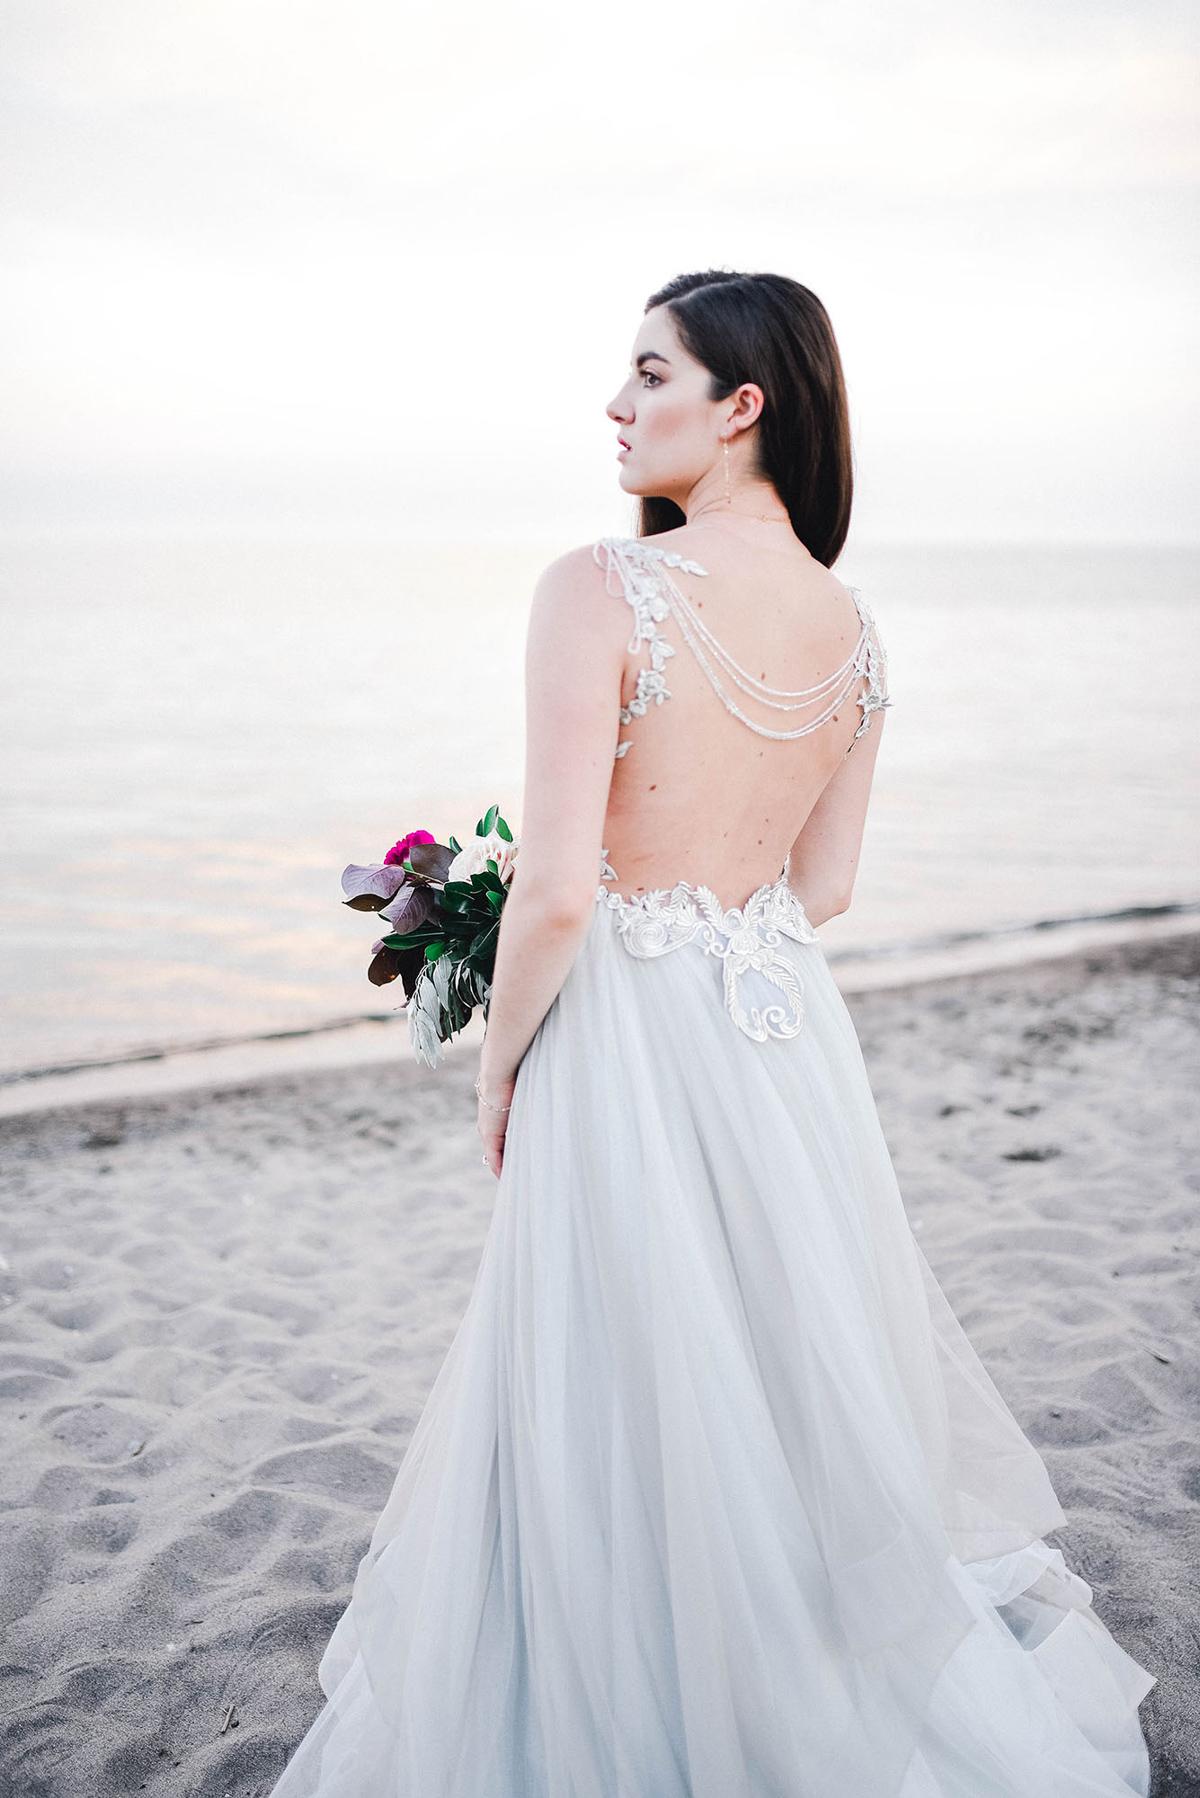 verveine-studios-vineyard-bride-swish-list-rouge-beach-park-scarborough-wedding-editorial-25.jpg